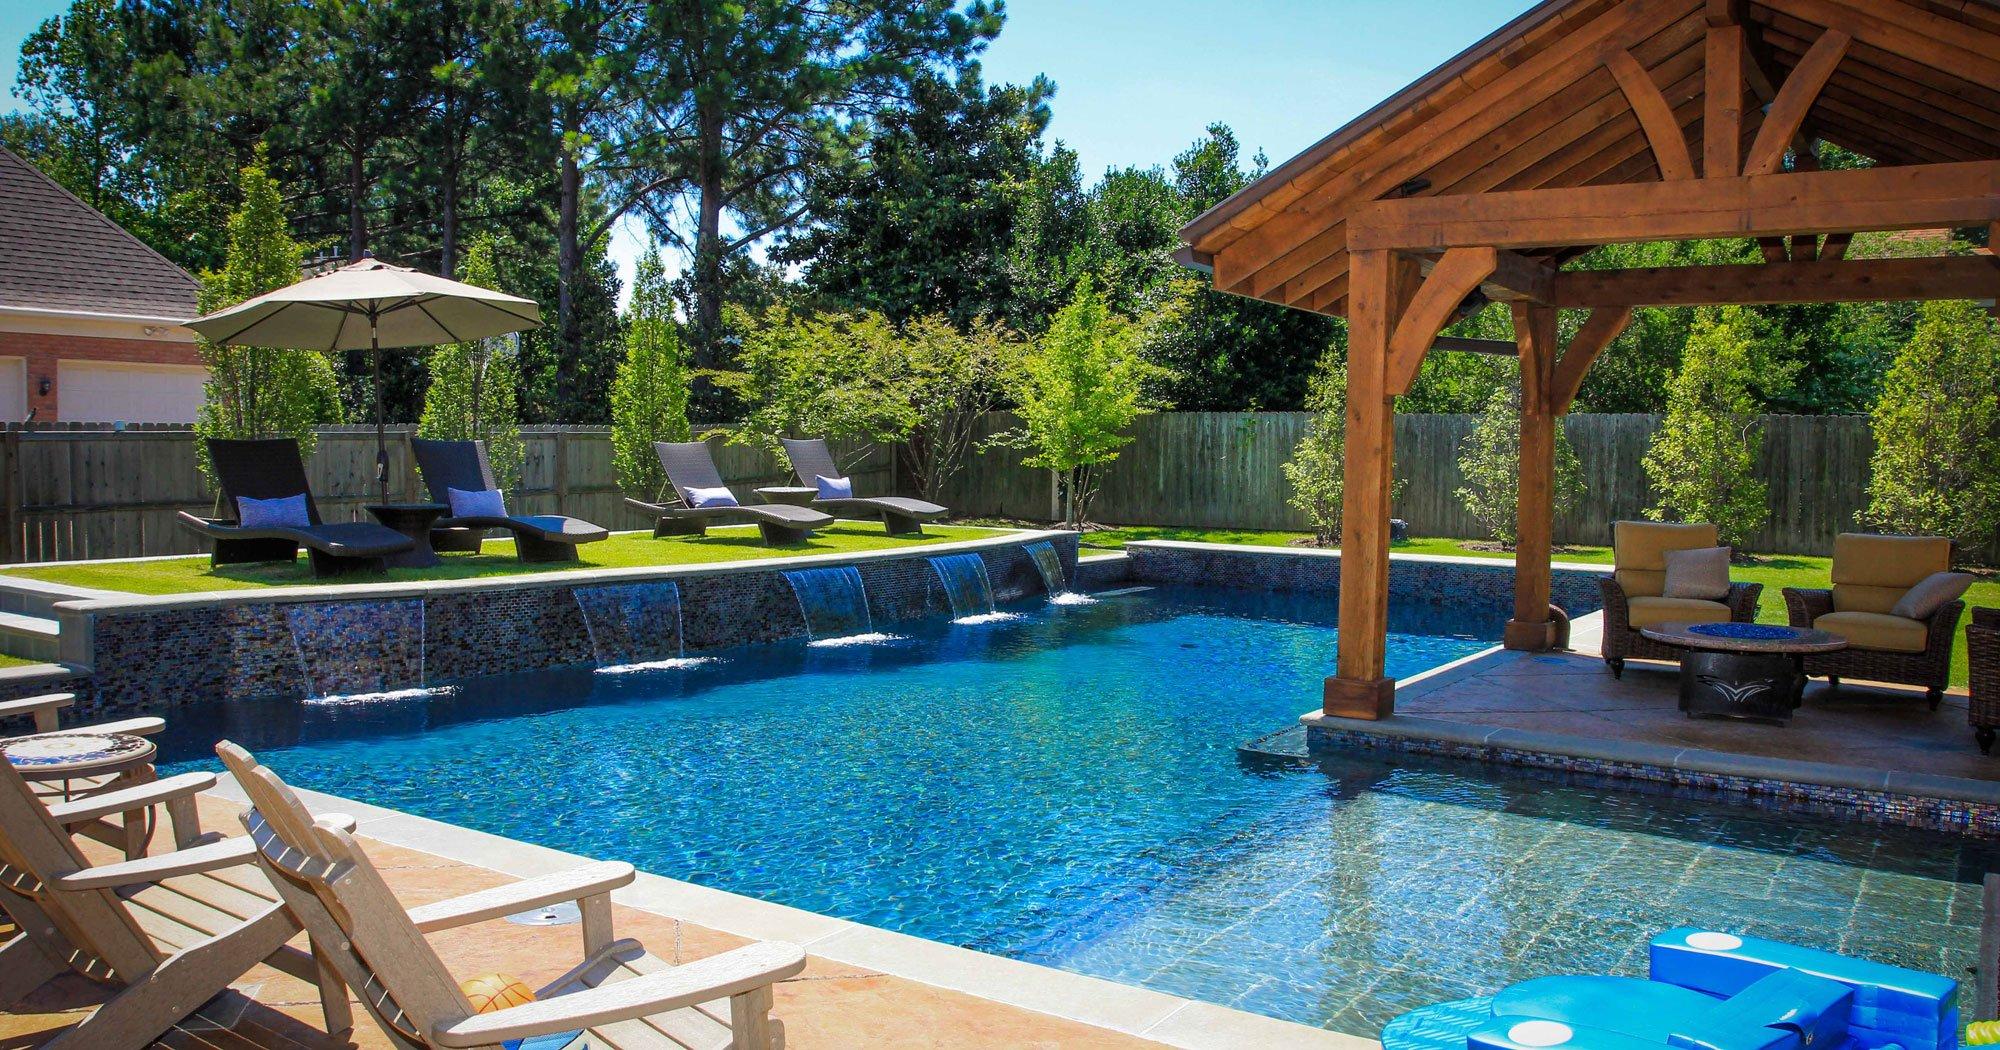 20 Backyard Pool Ideas for the Wealthy Homeowner on Cute Small Backyard Ideas id=14271